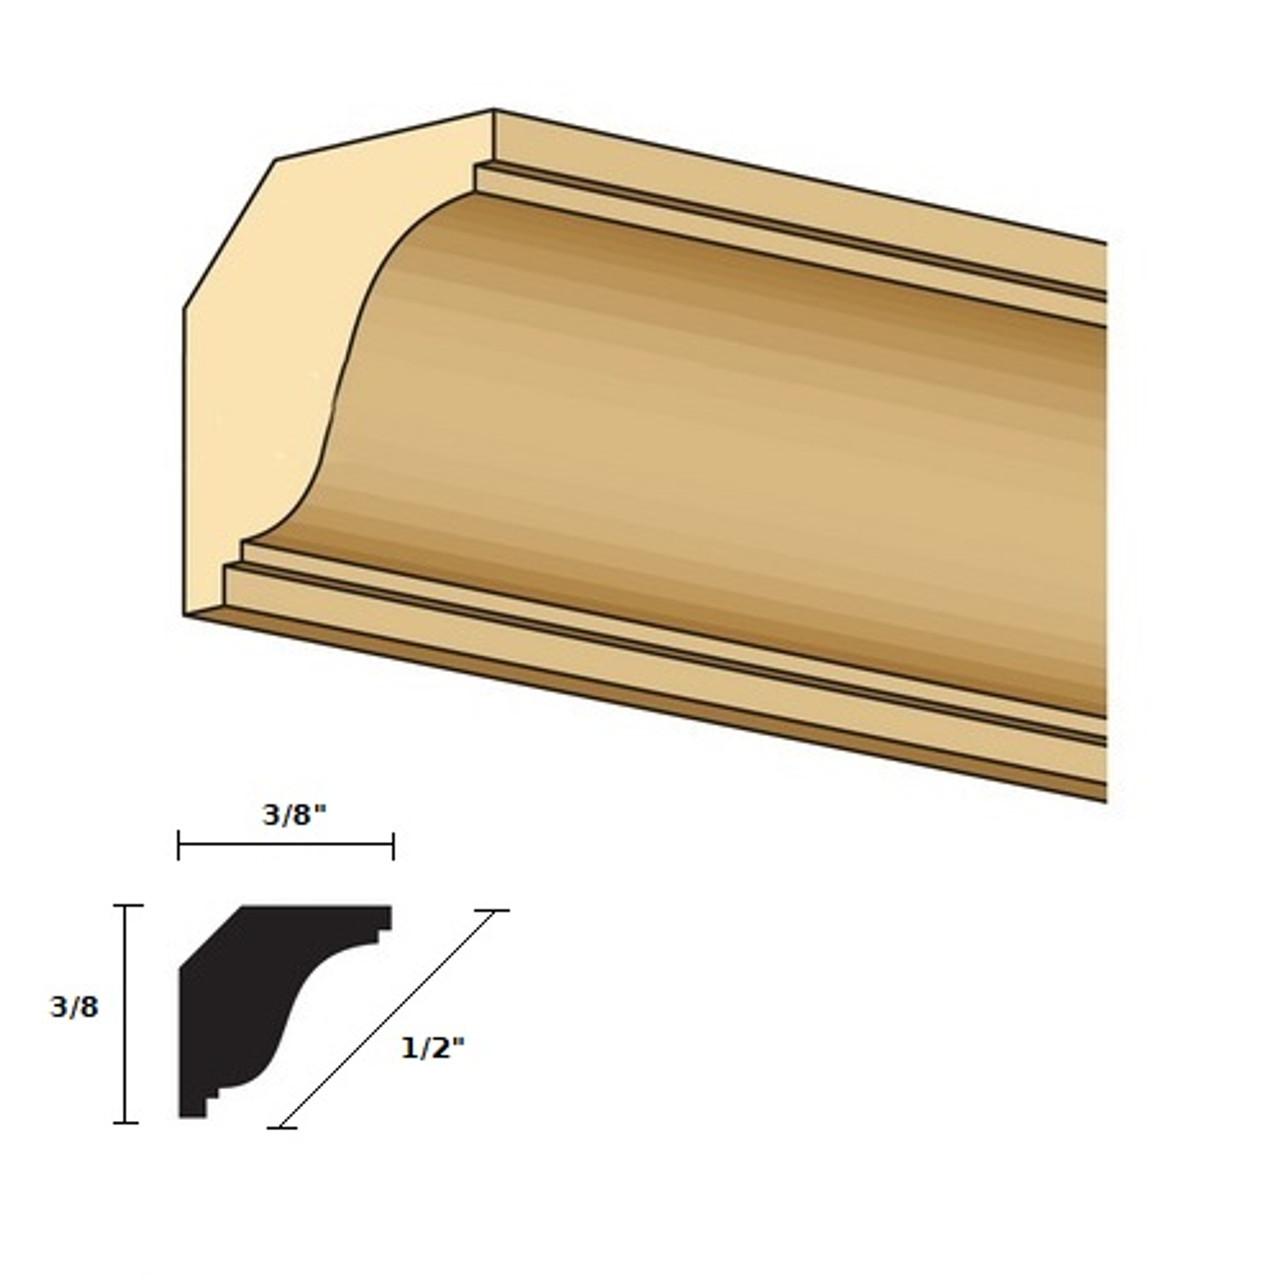 Illustration CLA77047 crown/cornice detail